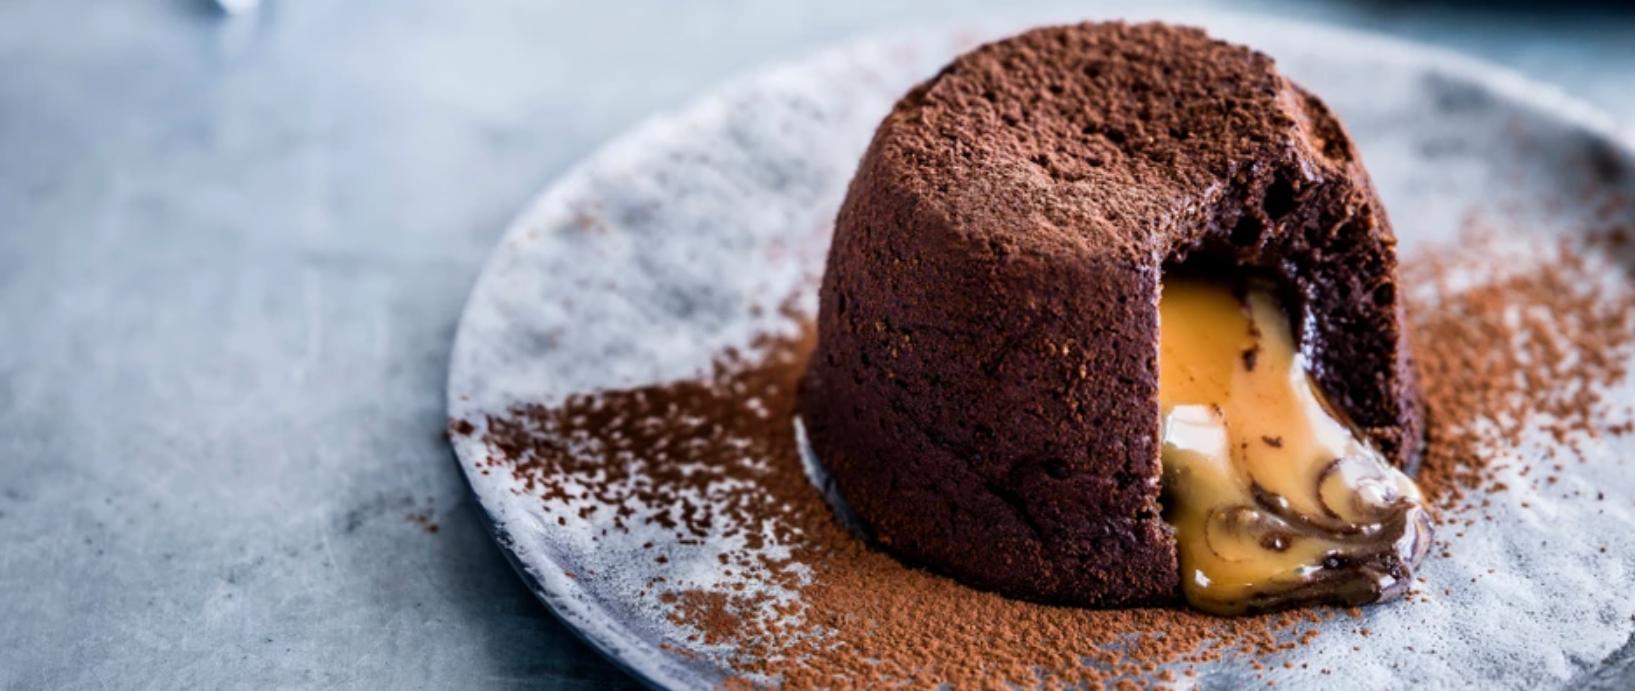 Salted caramel chocolate fondant